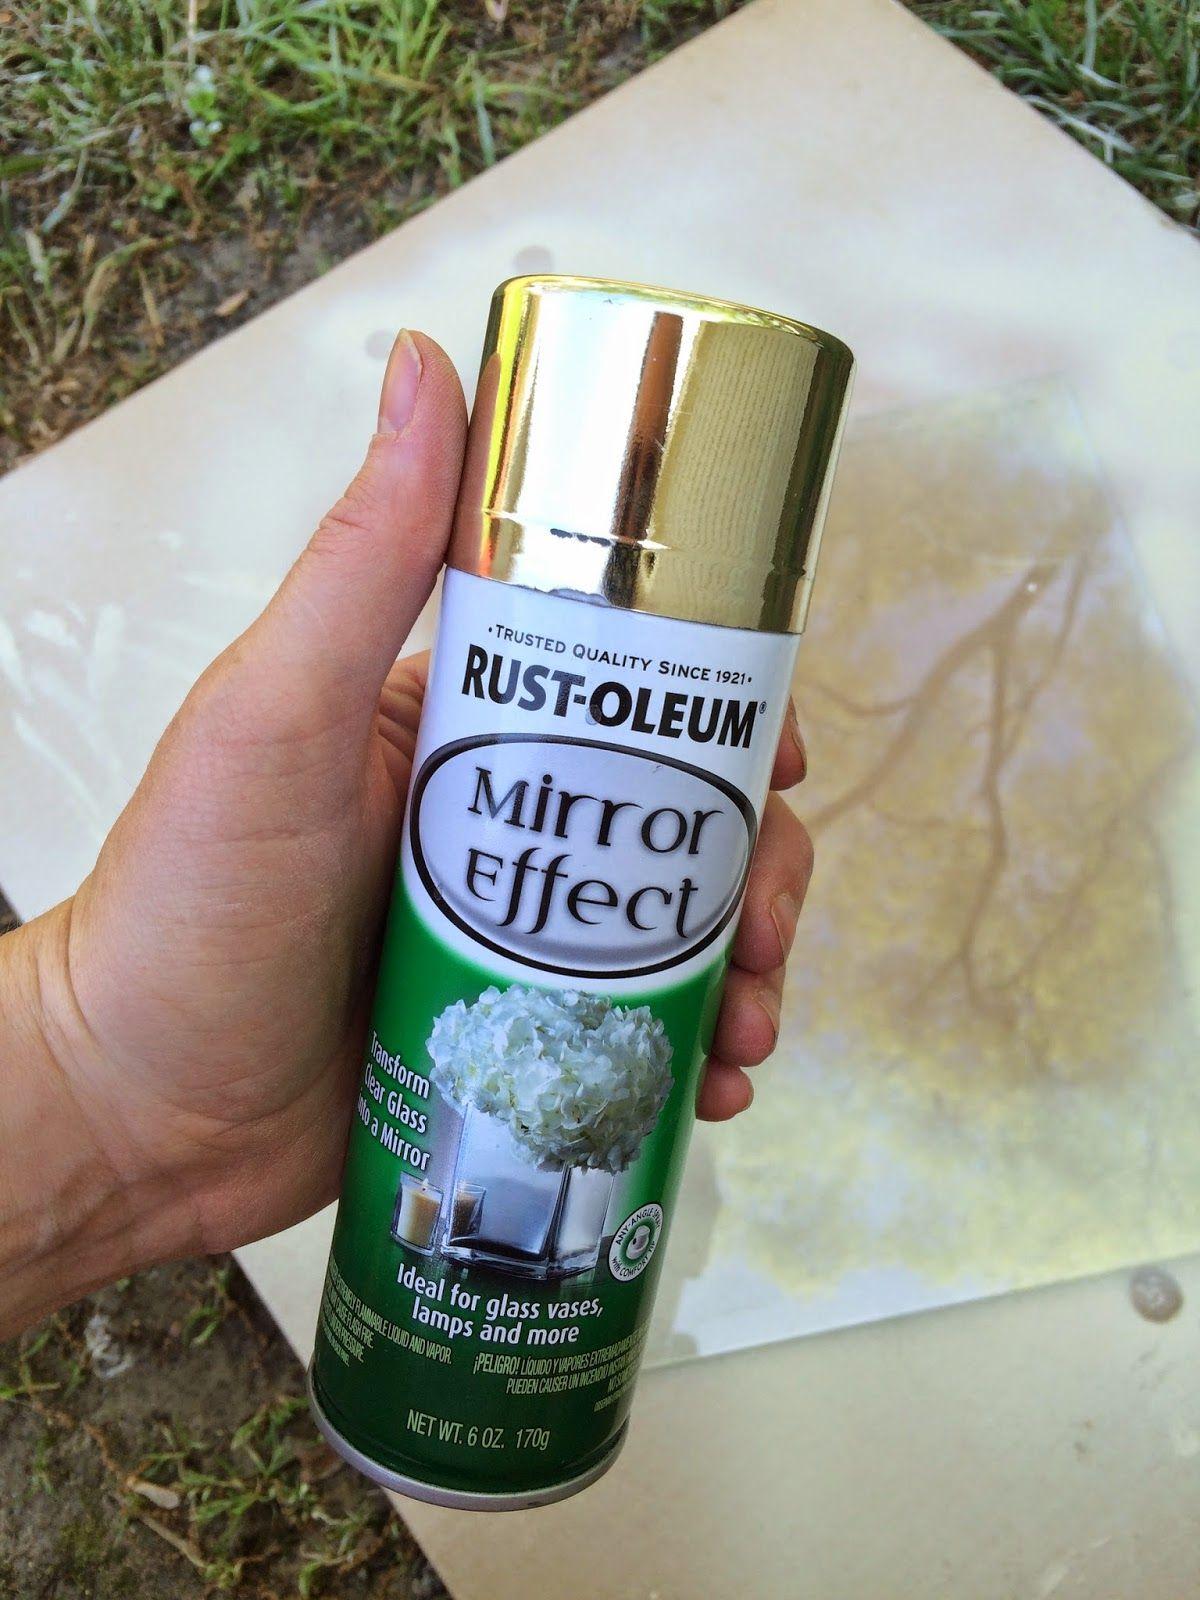 Diy Mirror Effect Spray Paint Travaux Manuels Ete Travaux Manuels Diy